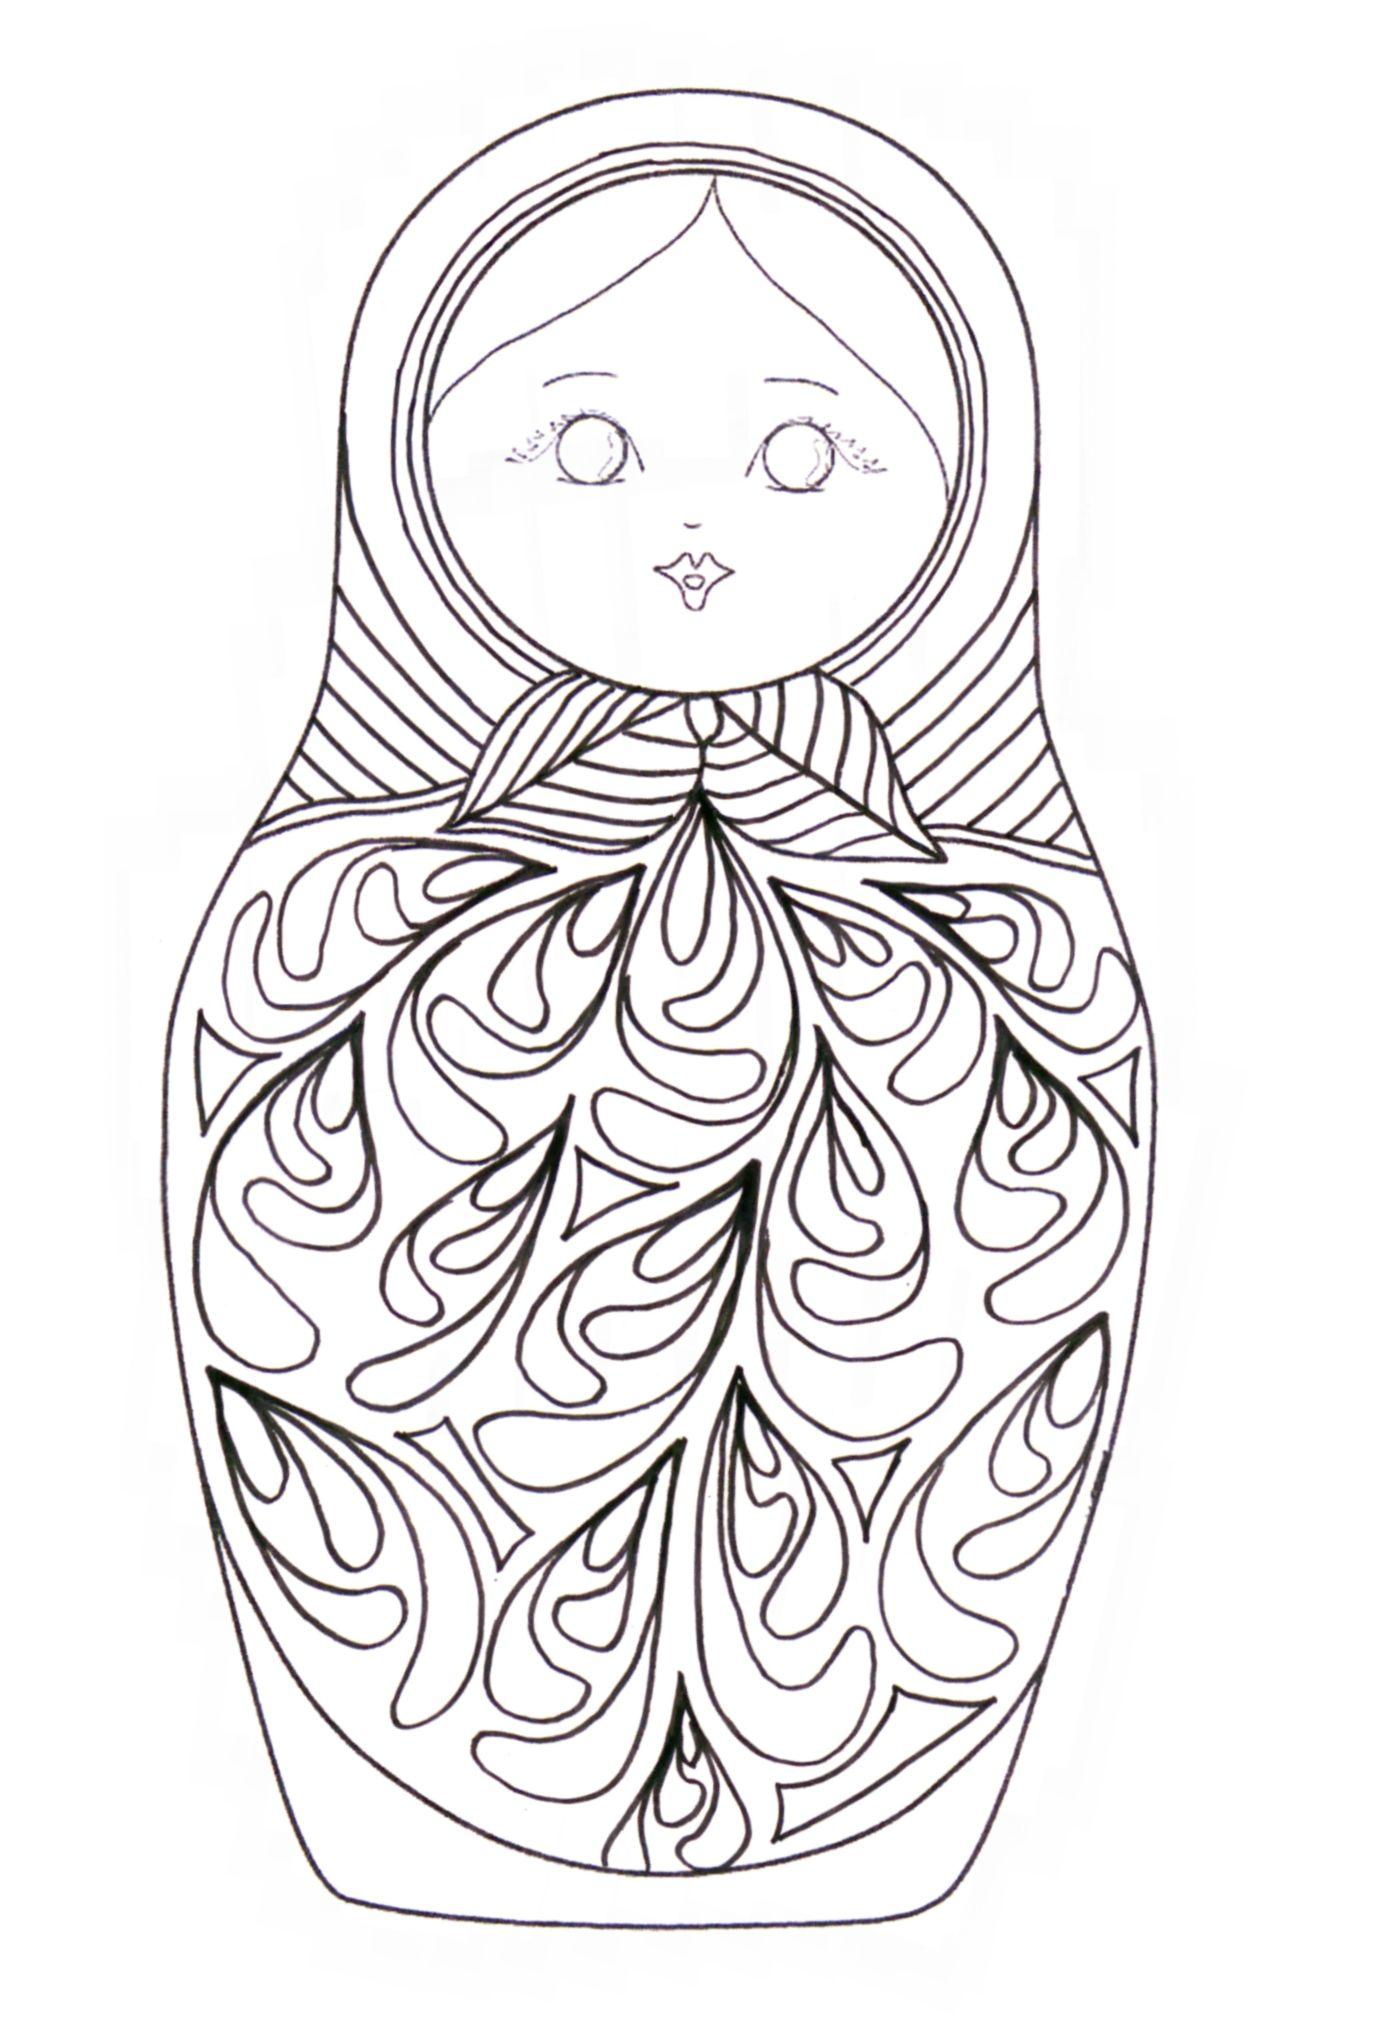 Matryoshka - coloriage | Russian martyoshka dolls | Pinterest ...